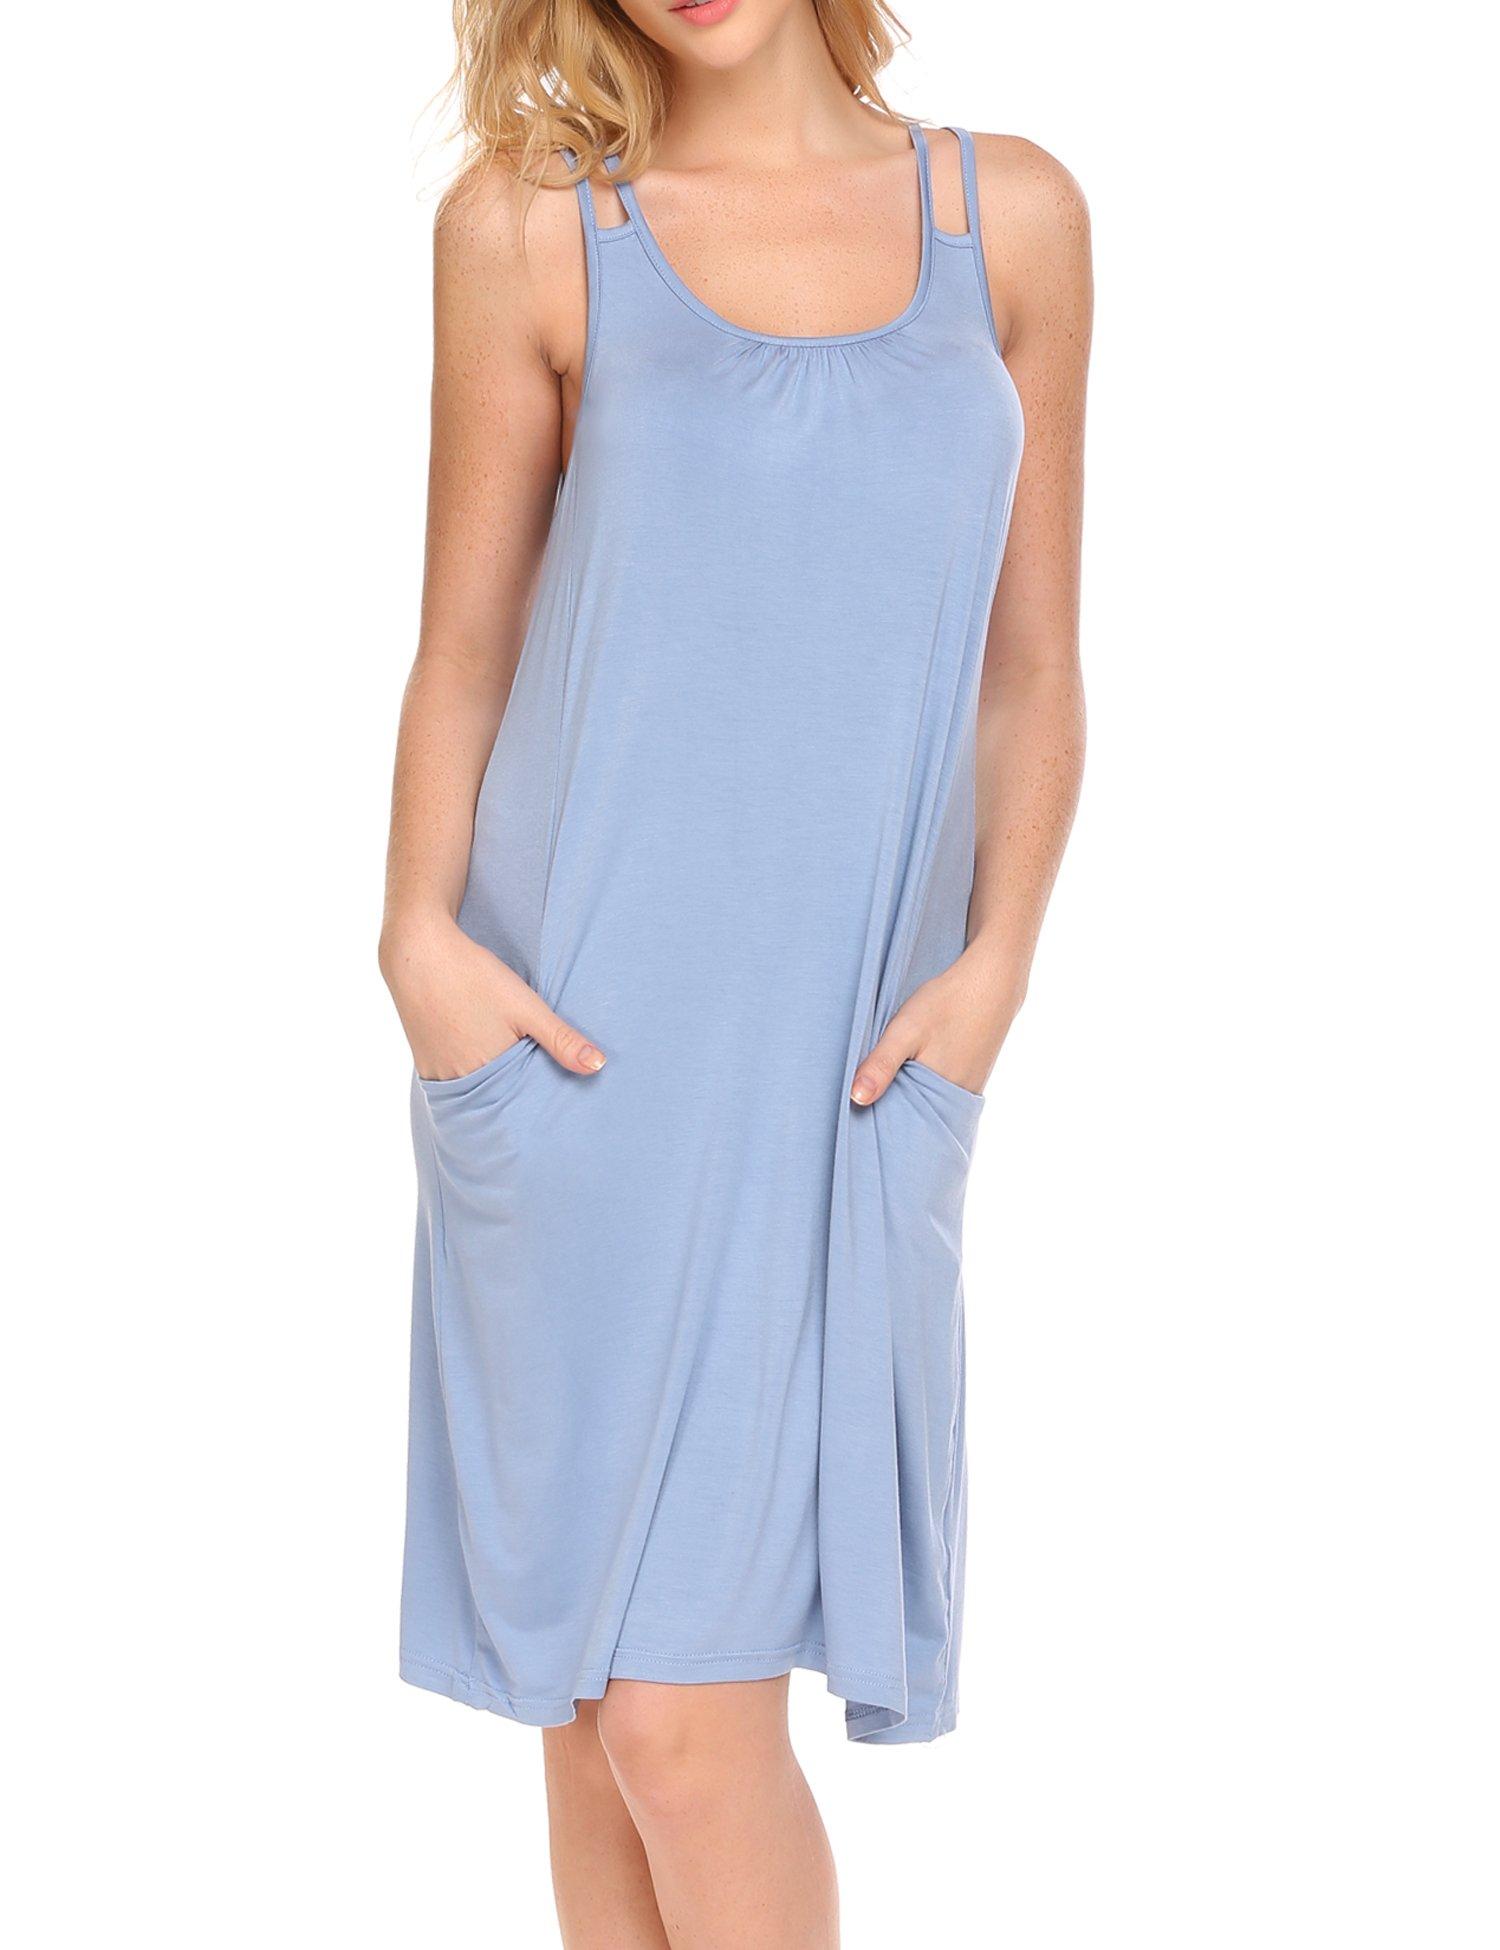 Hotouch Women Sleeveless Nightgown Cami Sleepwear Sleep Dress Nightgowns with Pocket